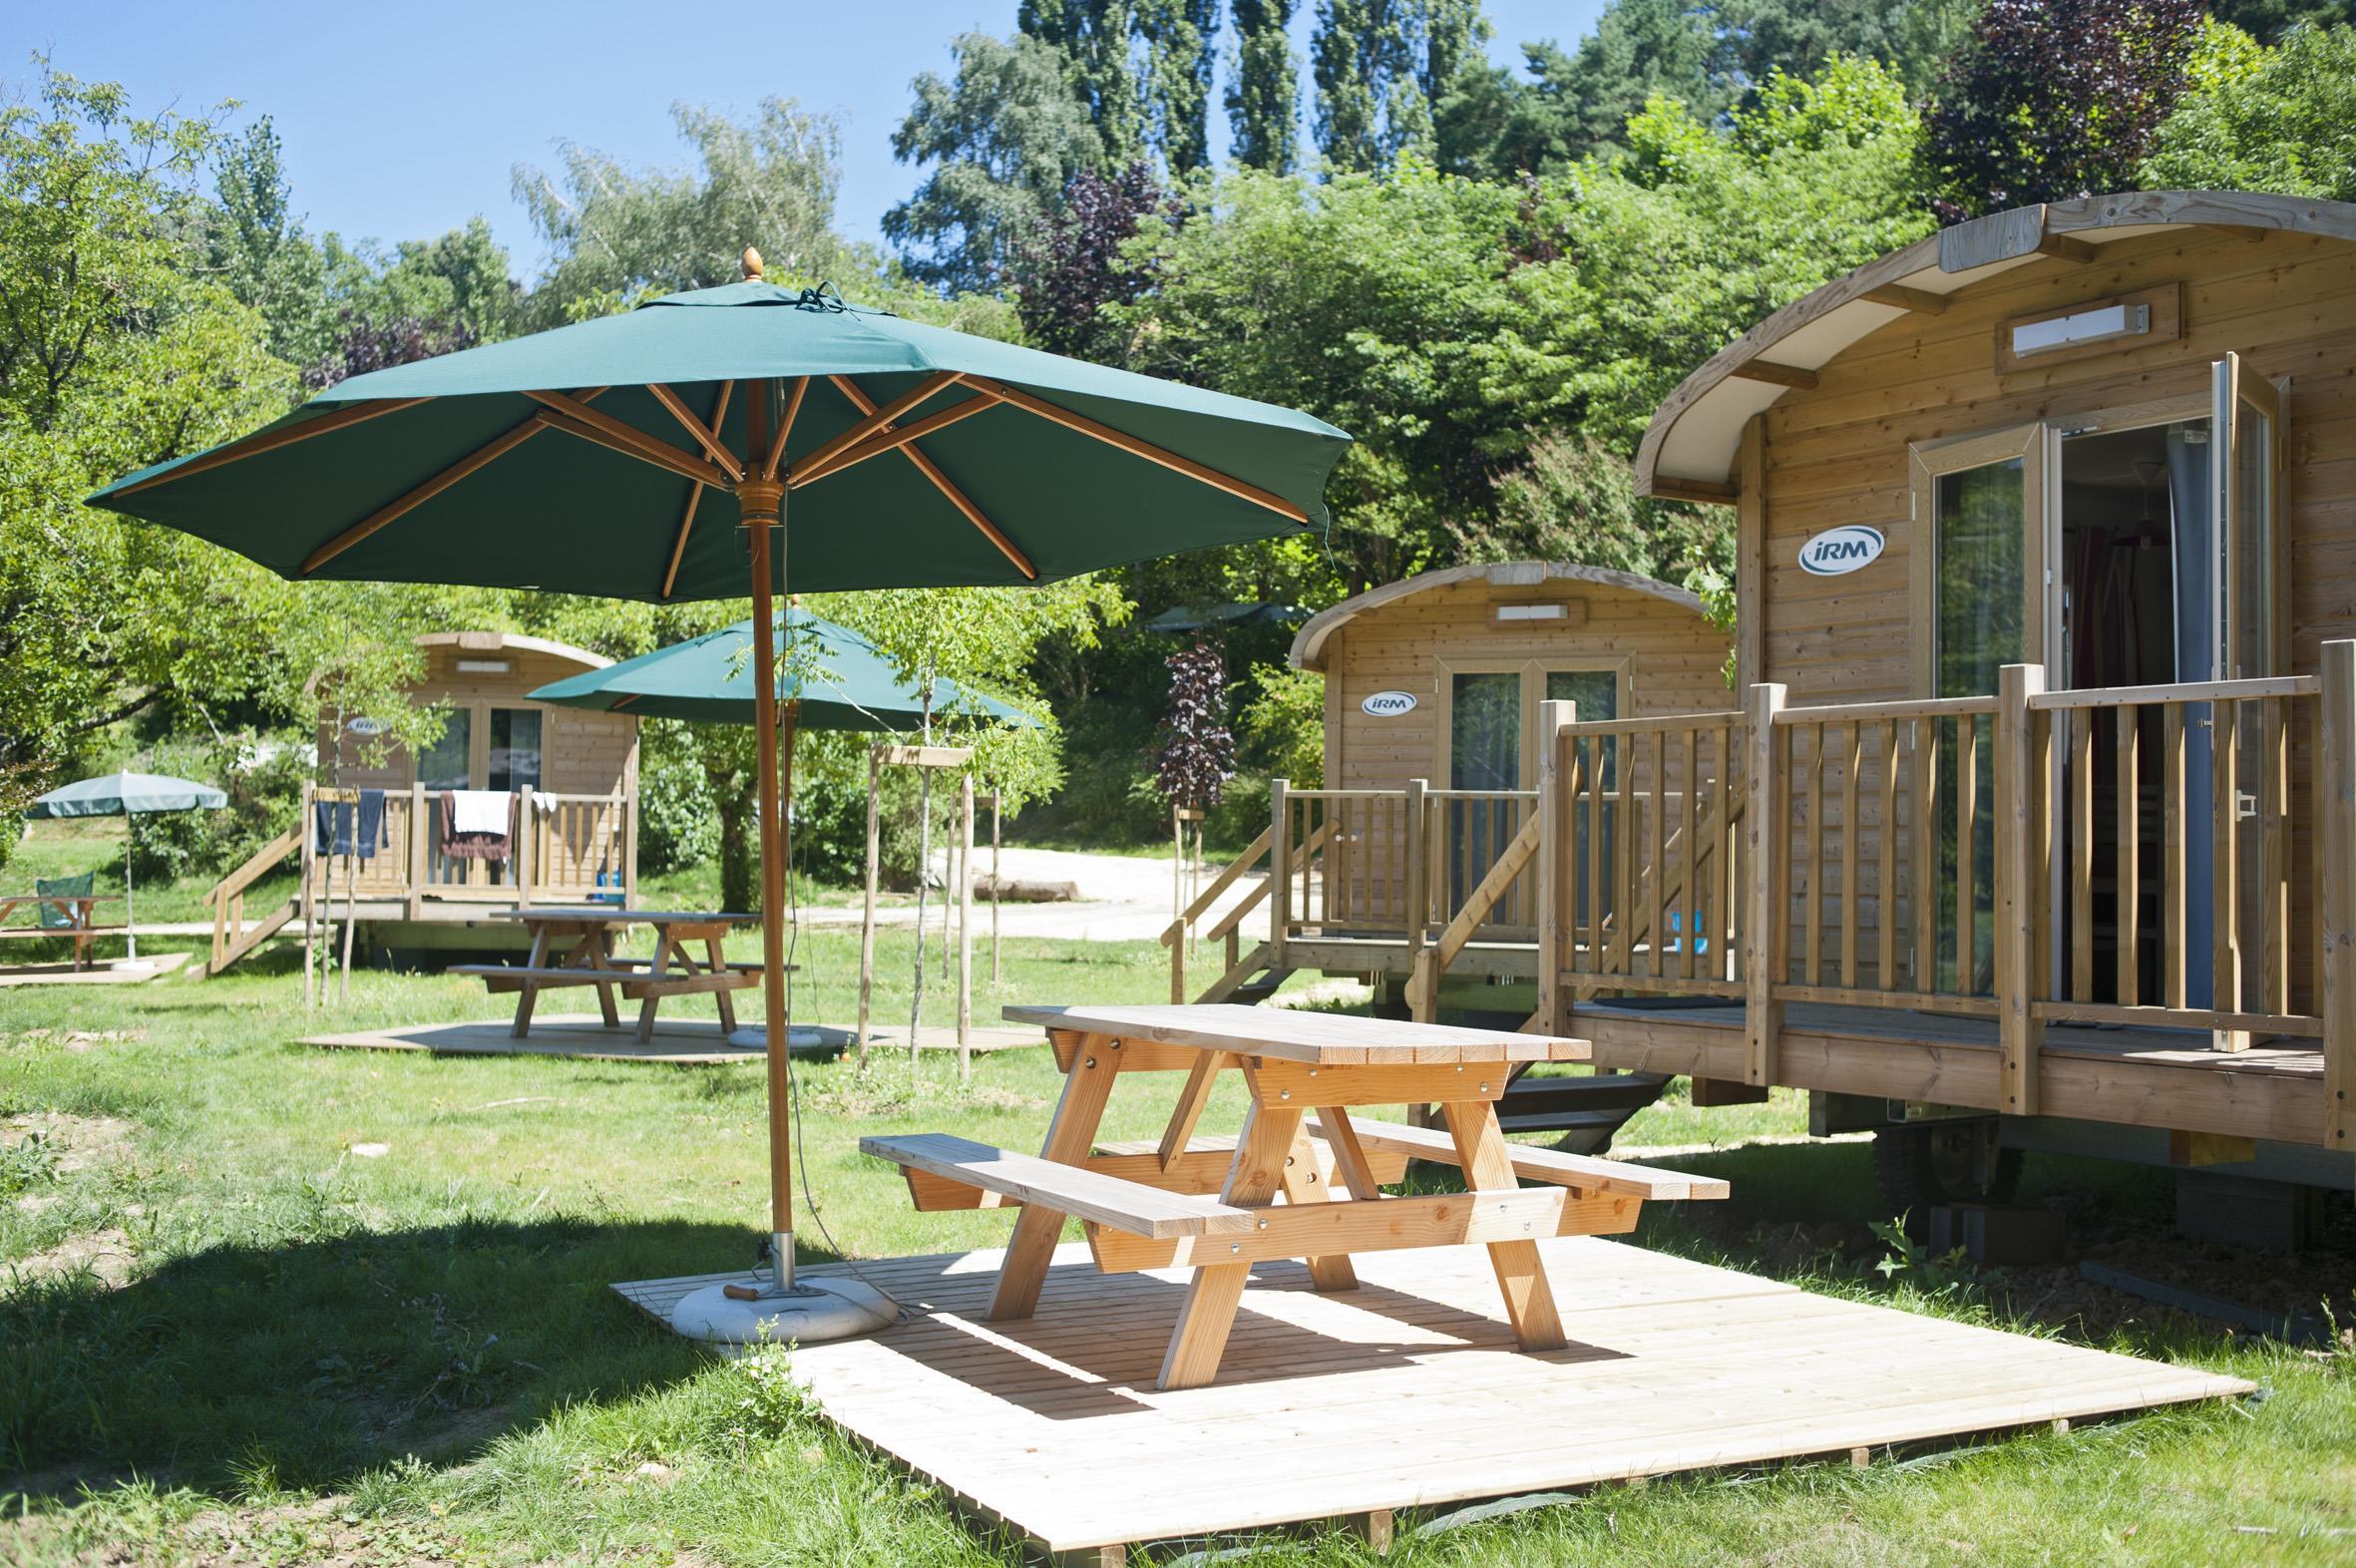 Camping Huttopia Sarlat, Sarlat-la-Caneda, Dordogne